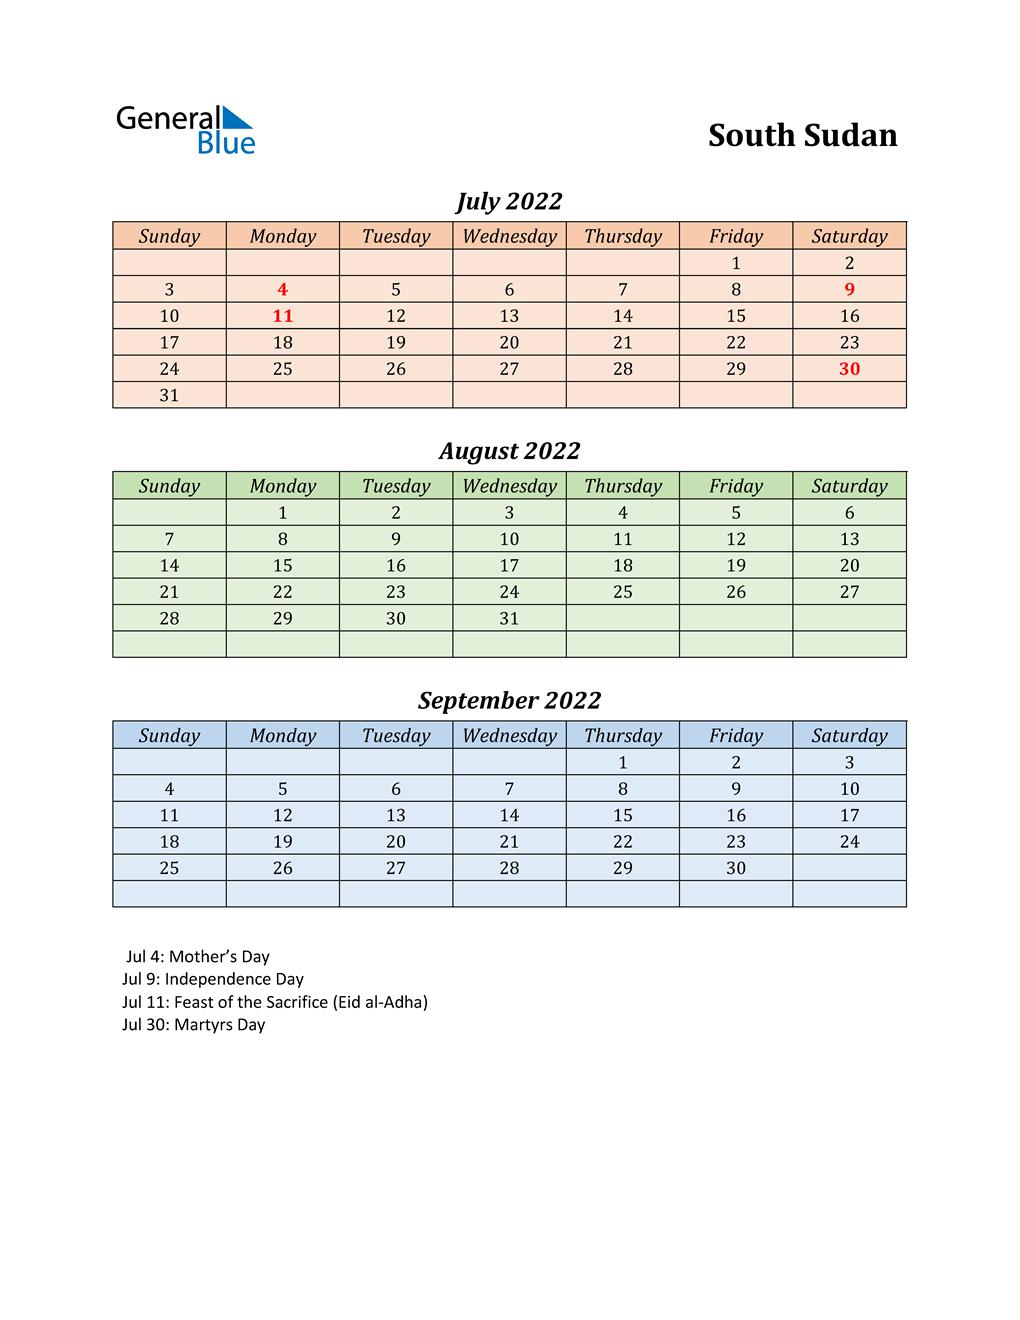 Q3 2022 Holiday Calendar - South Sudan